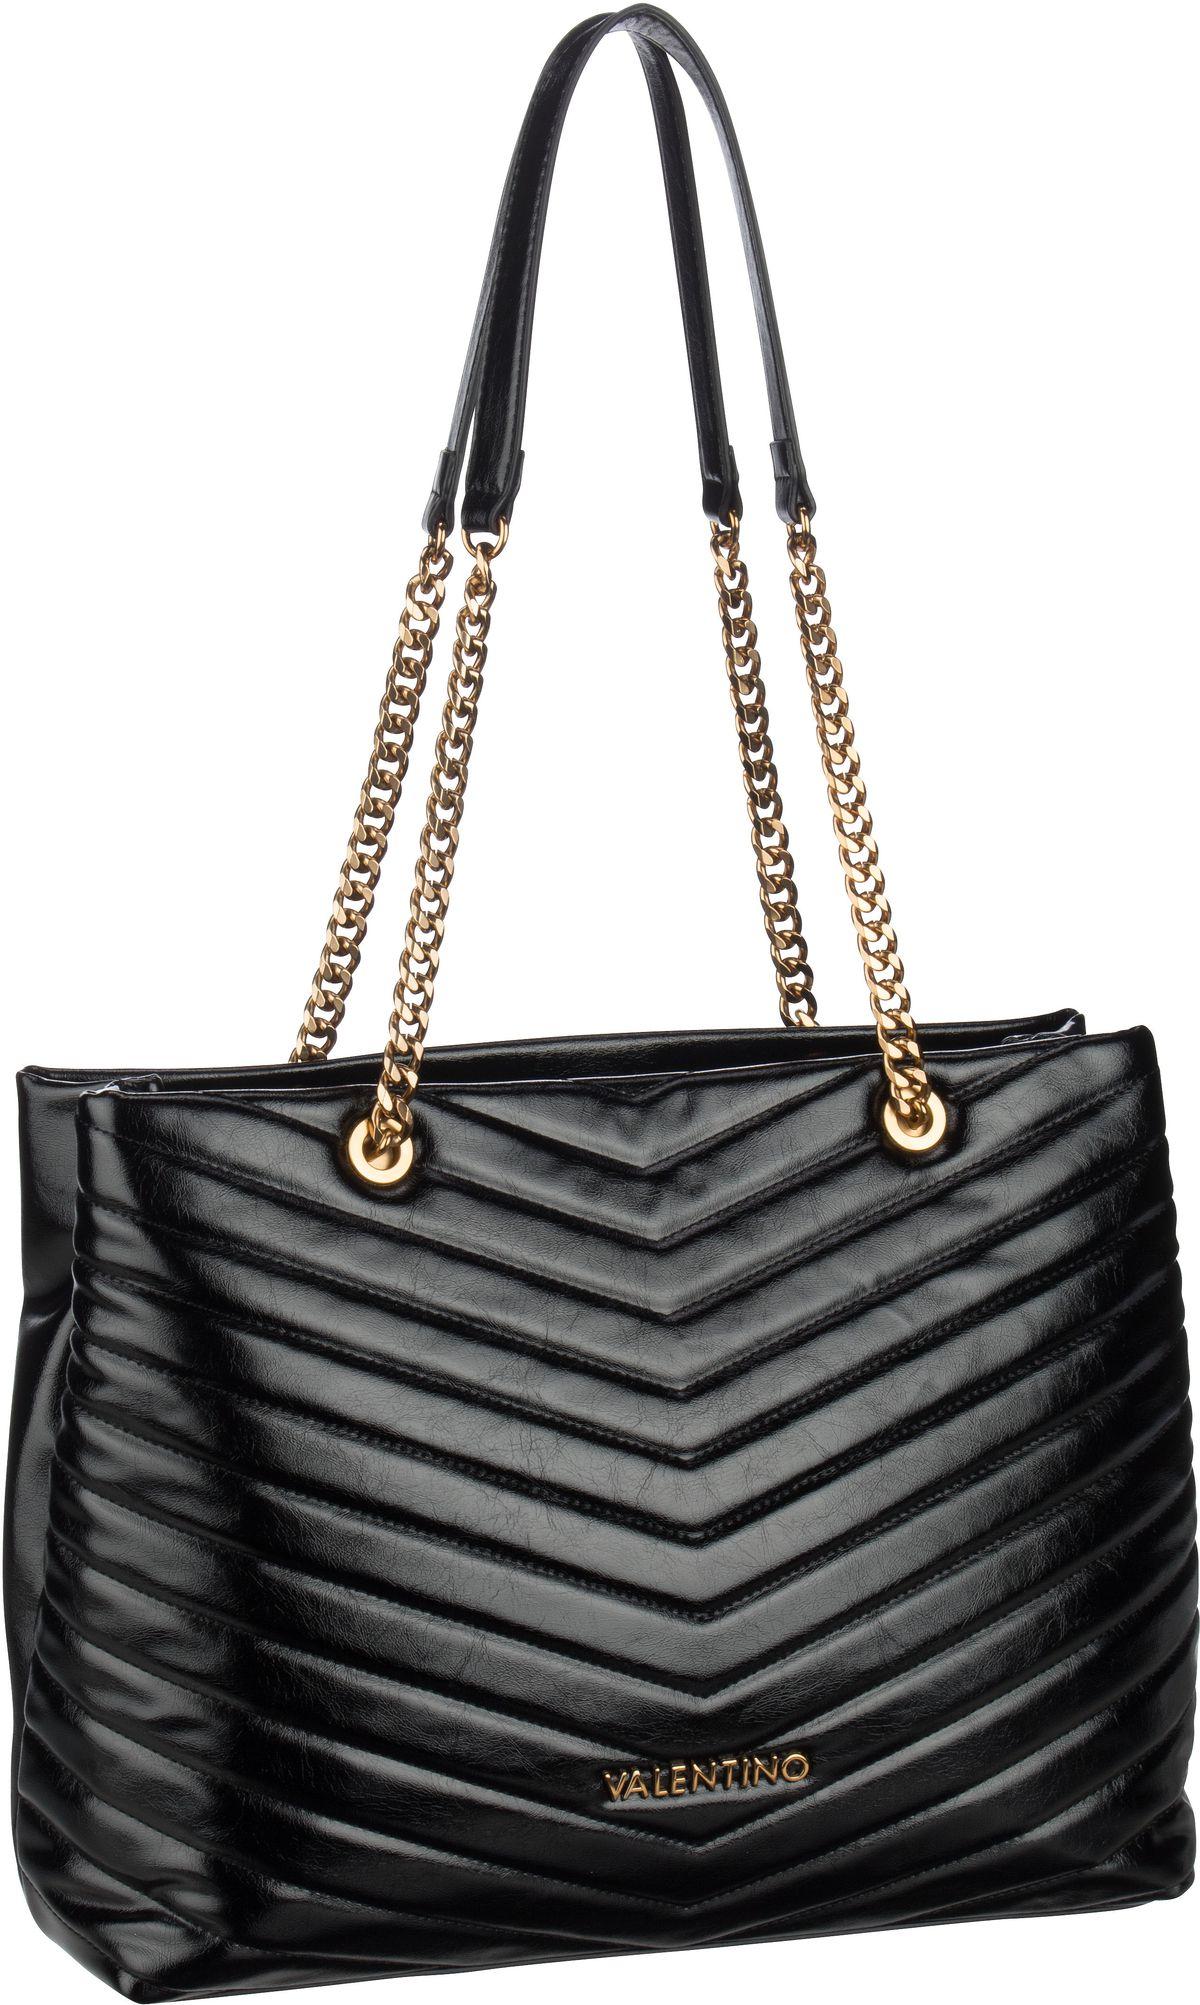 Bags Handtasche Grifone Shopping W05 Nero